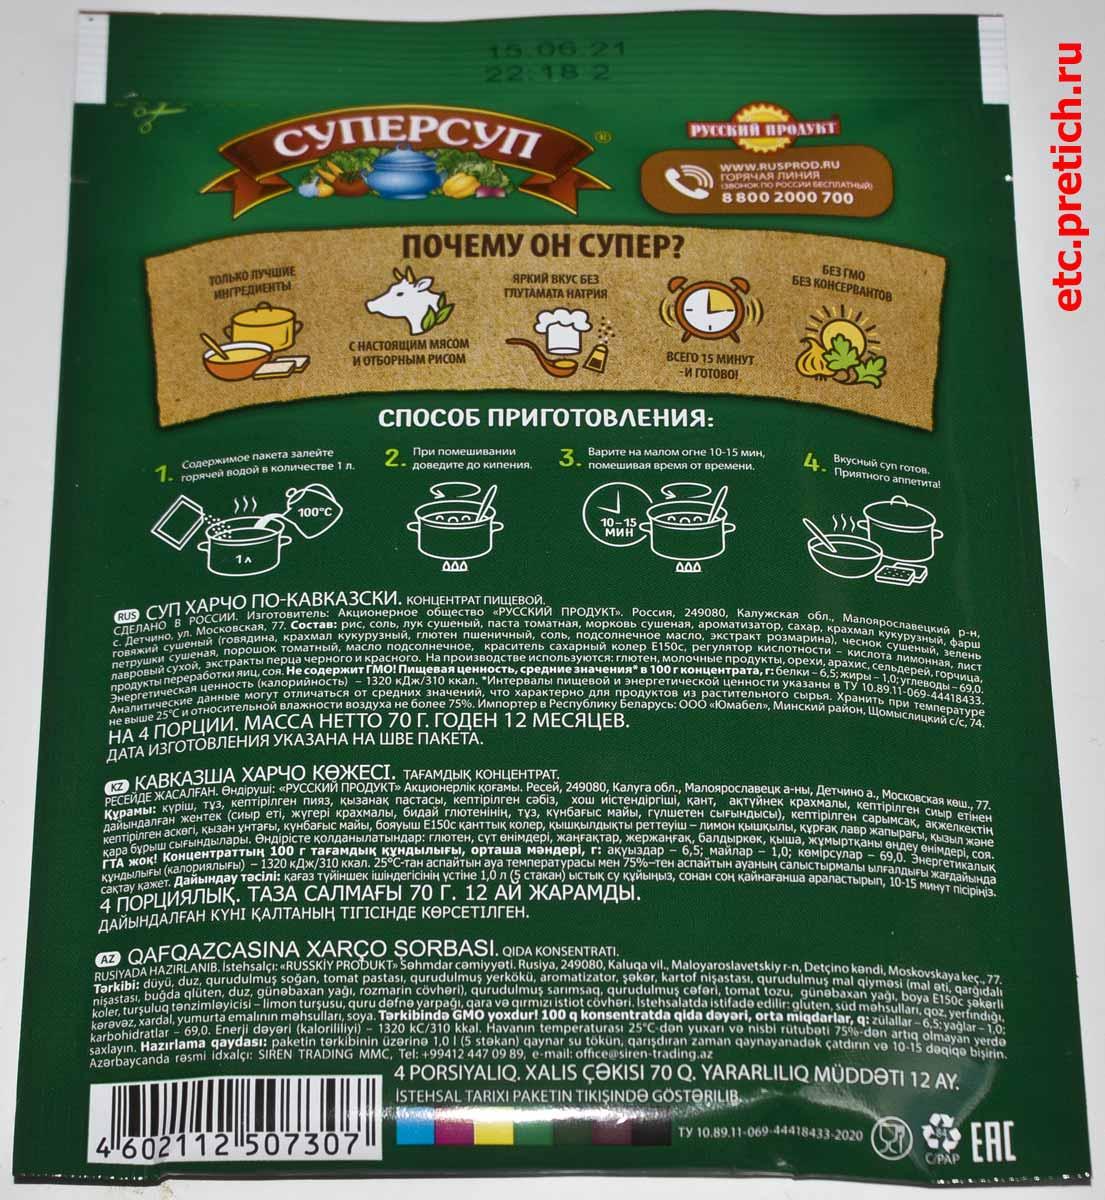 Суперсуп Харчо по-кавказски Русский продукт, состав, описание и обман